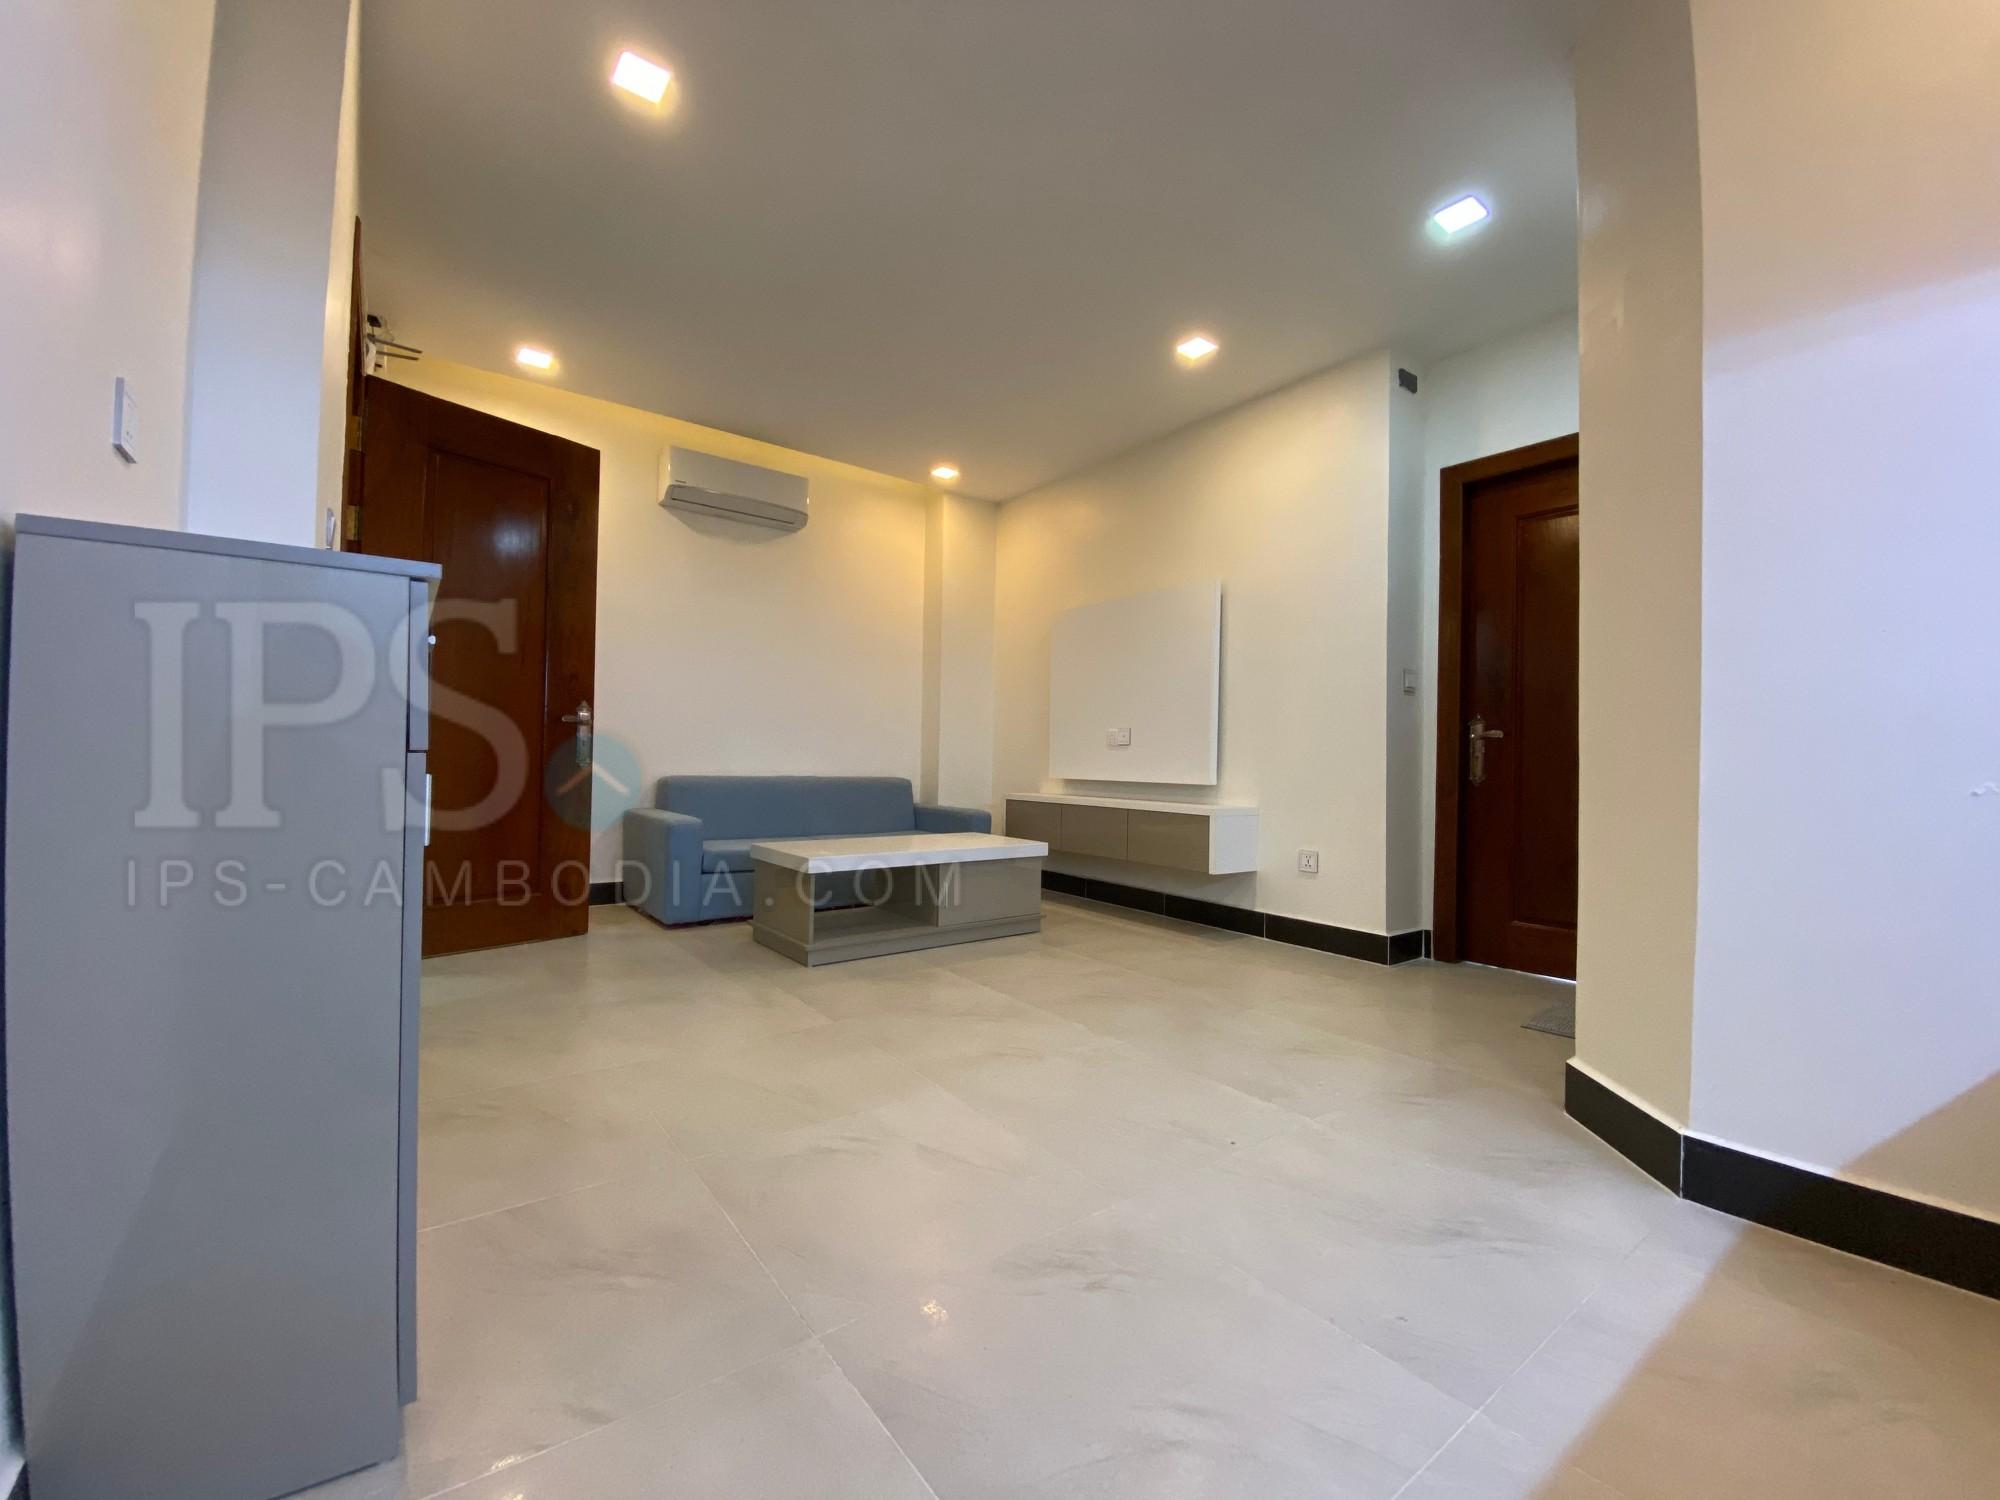 9-Storey Commercial Building For Sale - BKK 2, Phnom Penh